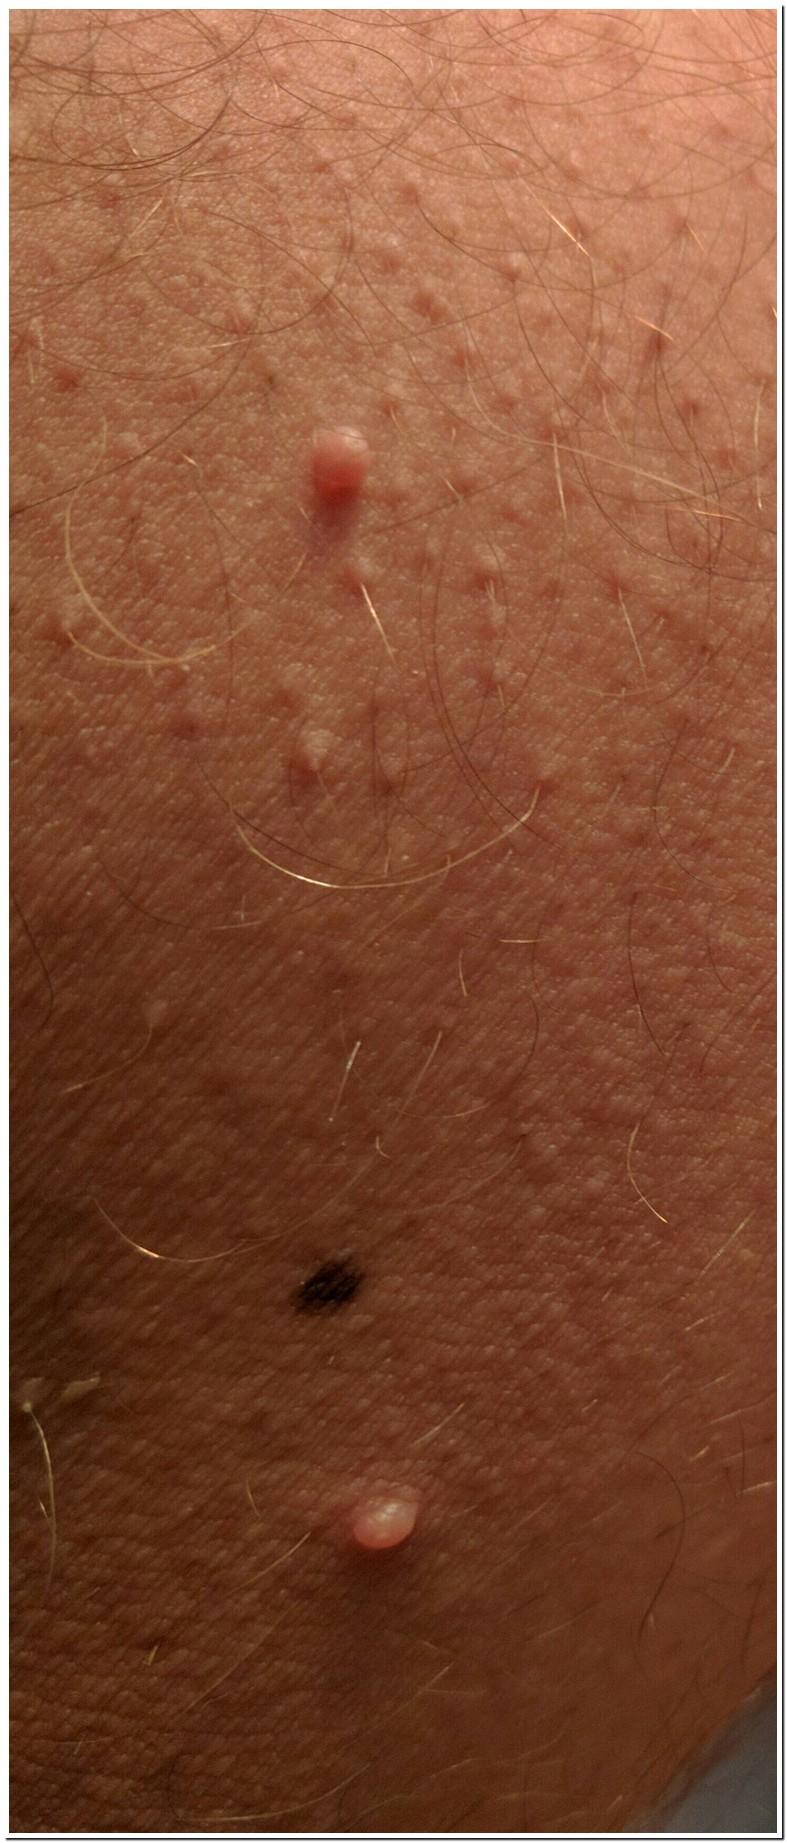 Red Spots On Inner Thigh Near Groin